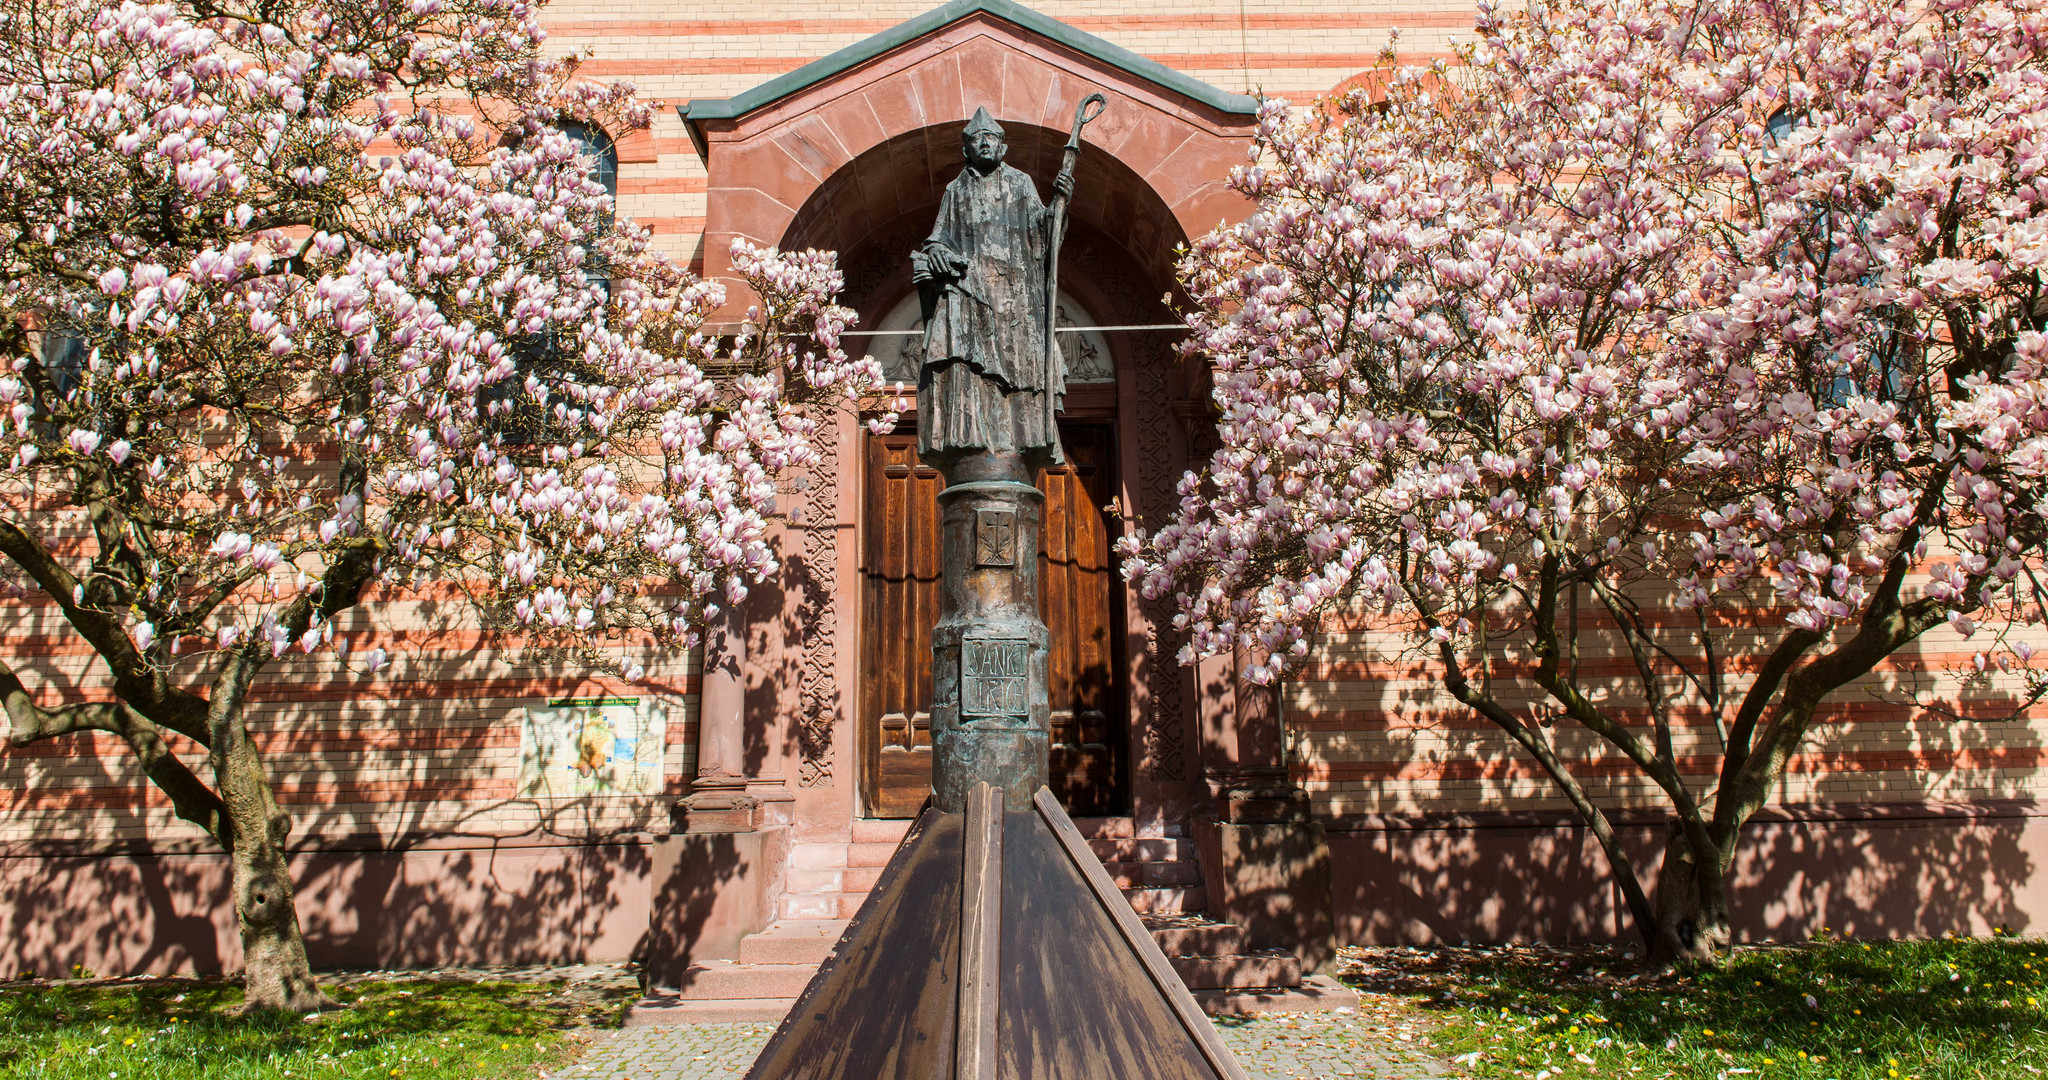 Magnolien vor unserer Pfarrkirche - St. Jakob in Friedberg